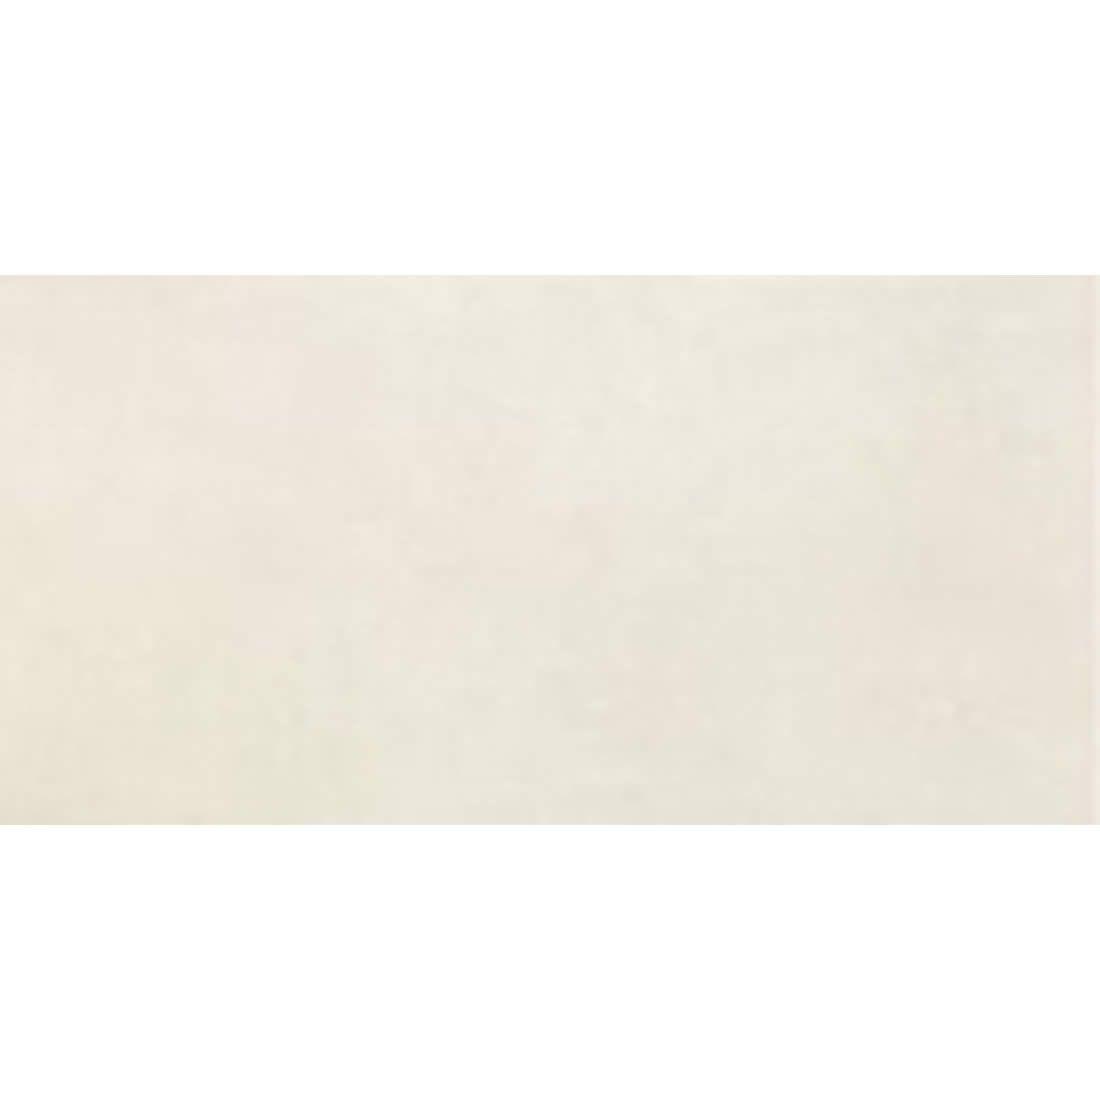 Porcelanato Portinari 43.7 x 87.7 Urban Quartzo Acetinado Ref 55553